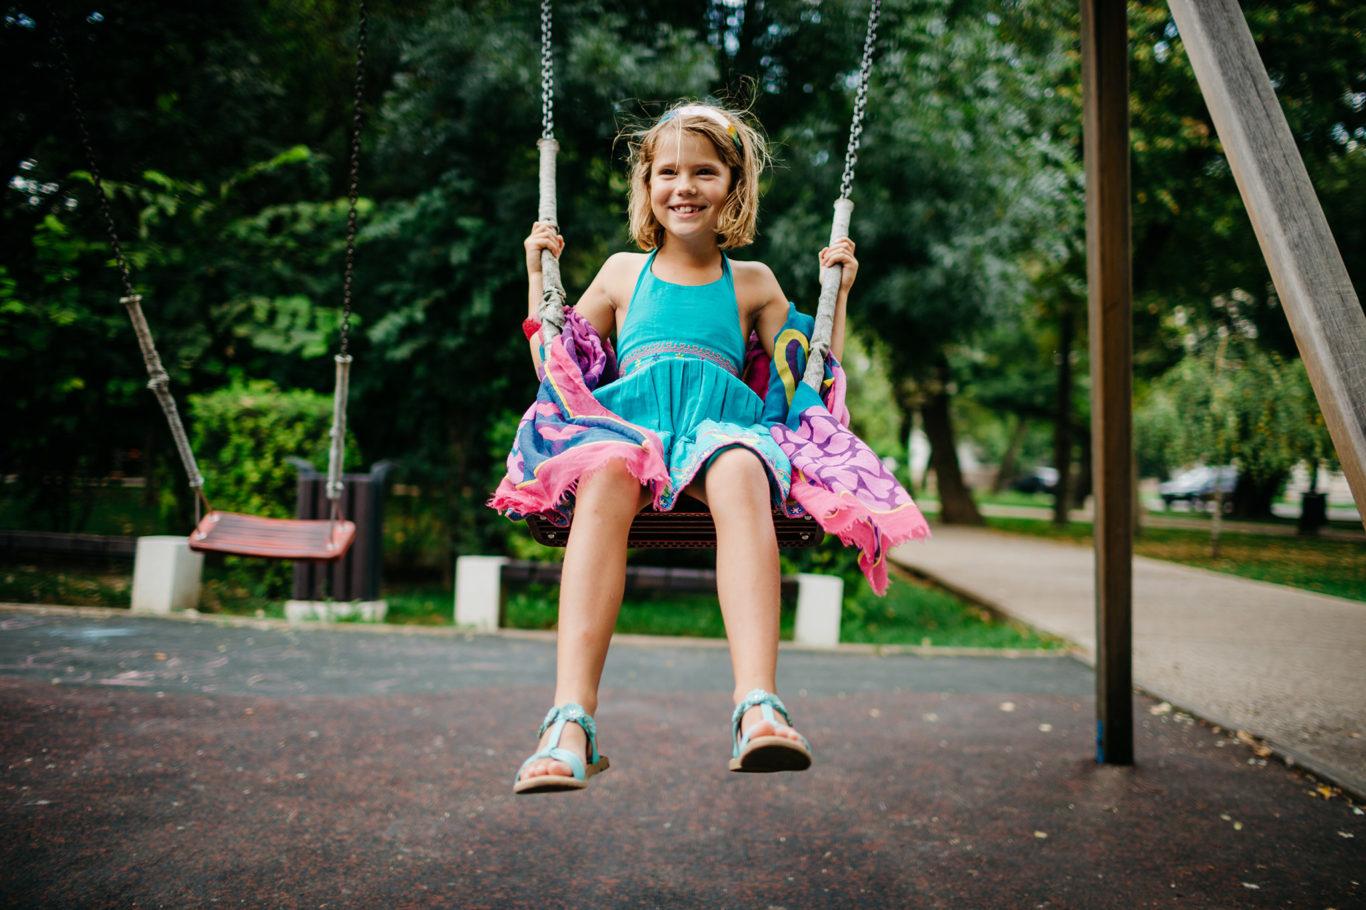 0032-fotografii-familie-ioana-alex-maia-roxi-fotograf-ciprian-dumitrescu-cd2_1646